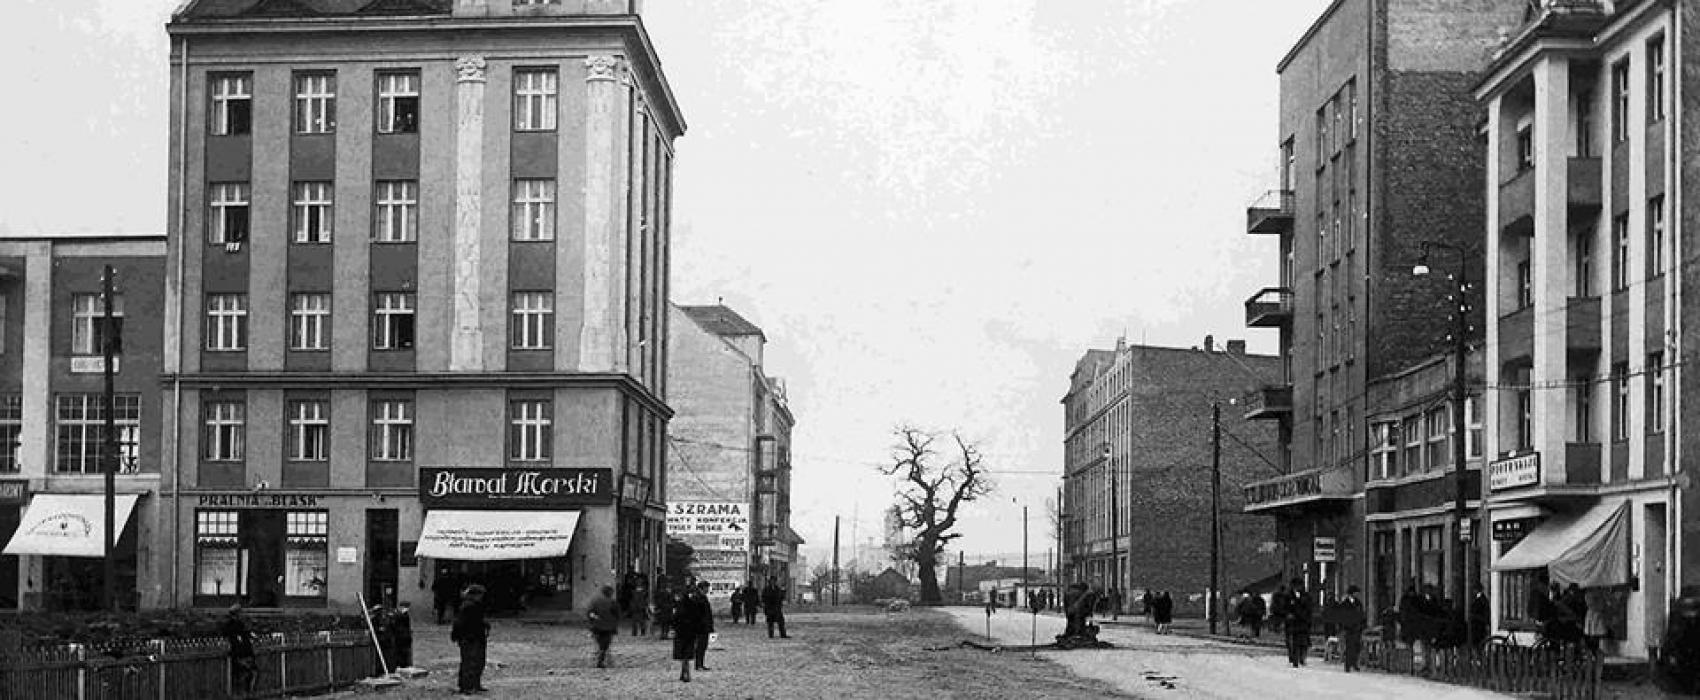 Kaszubska Gdynia. Kaszubski dąb 8